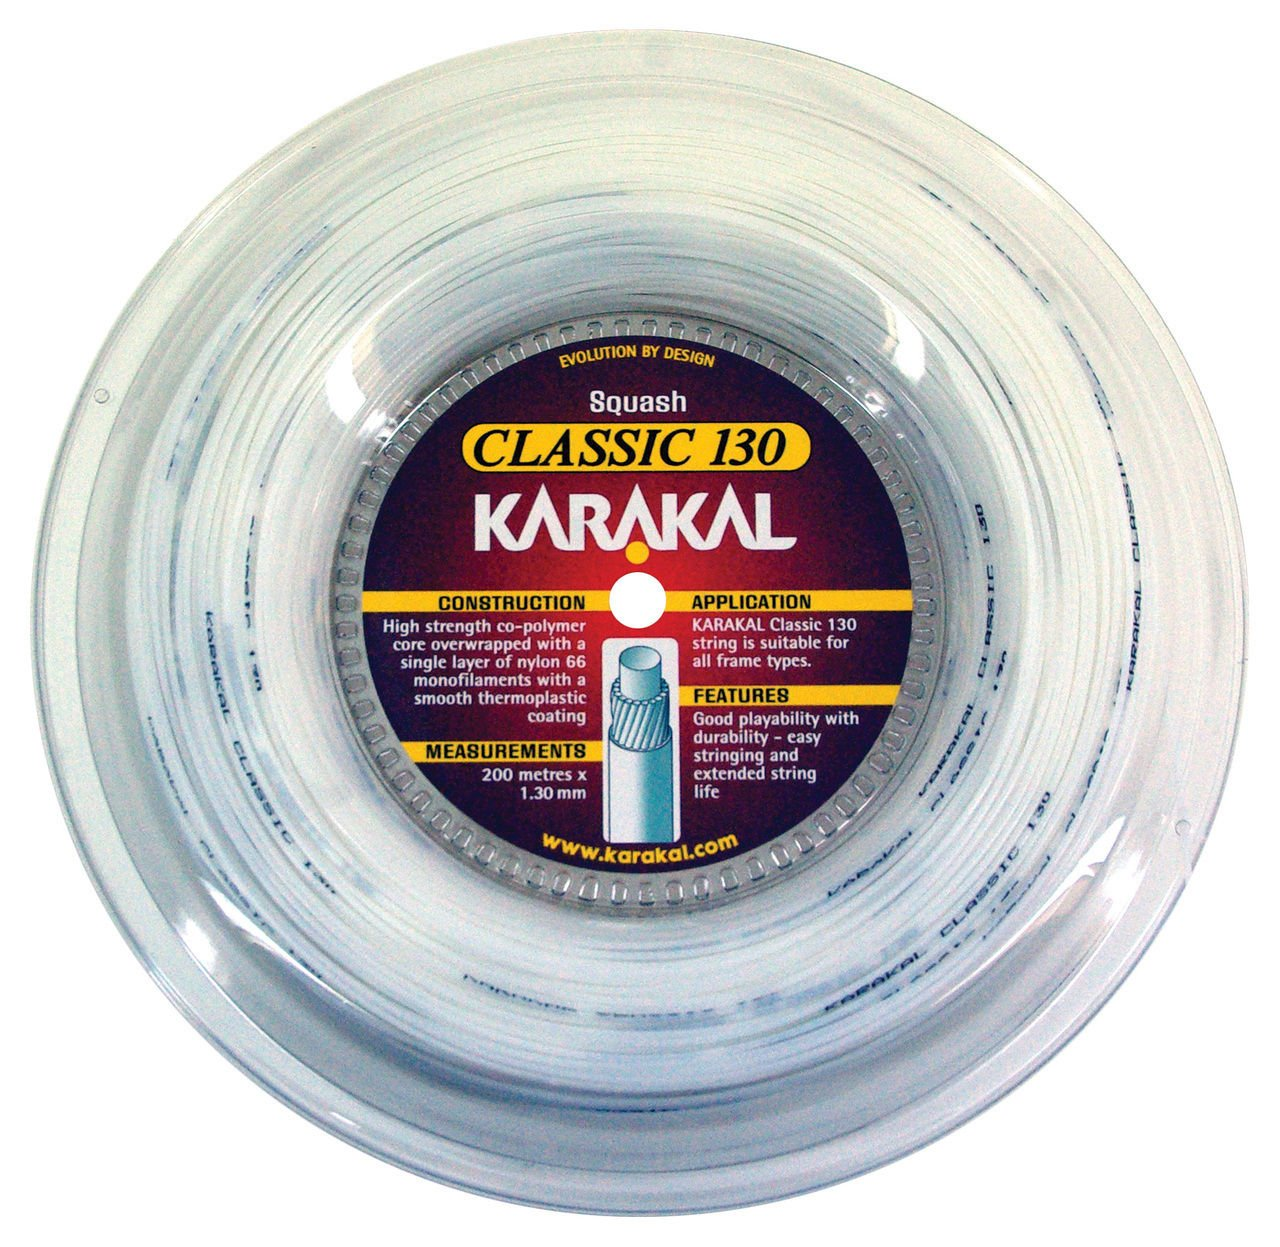 Karakal–Cuerdas para raqueta de squash clásica 16/1,30mm con carrete de 200m